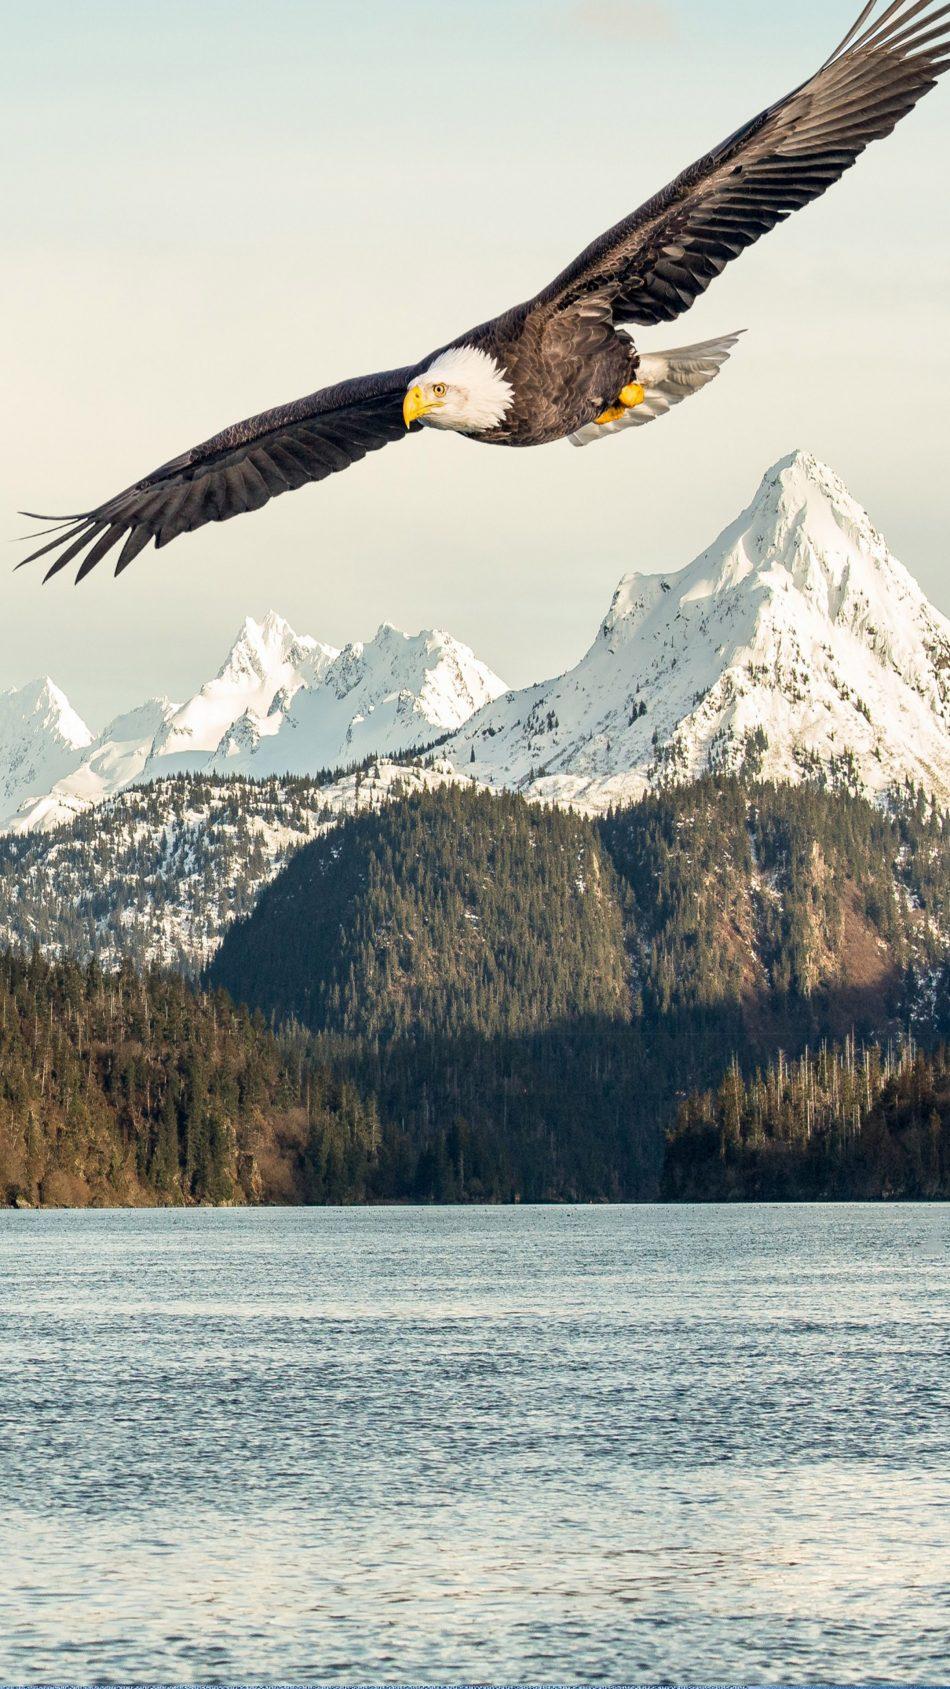 Eagle Mountains Lake 4K Ultra HD Mobile Wallpaper